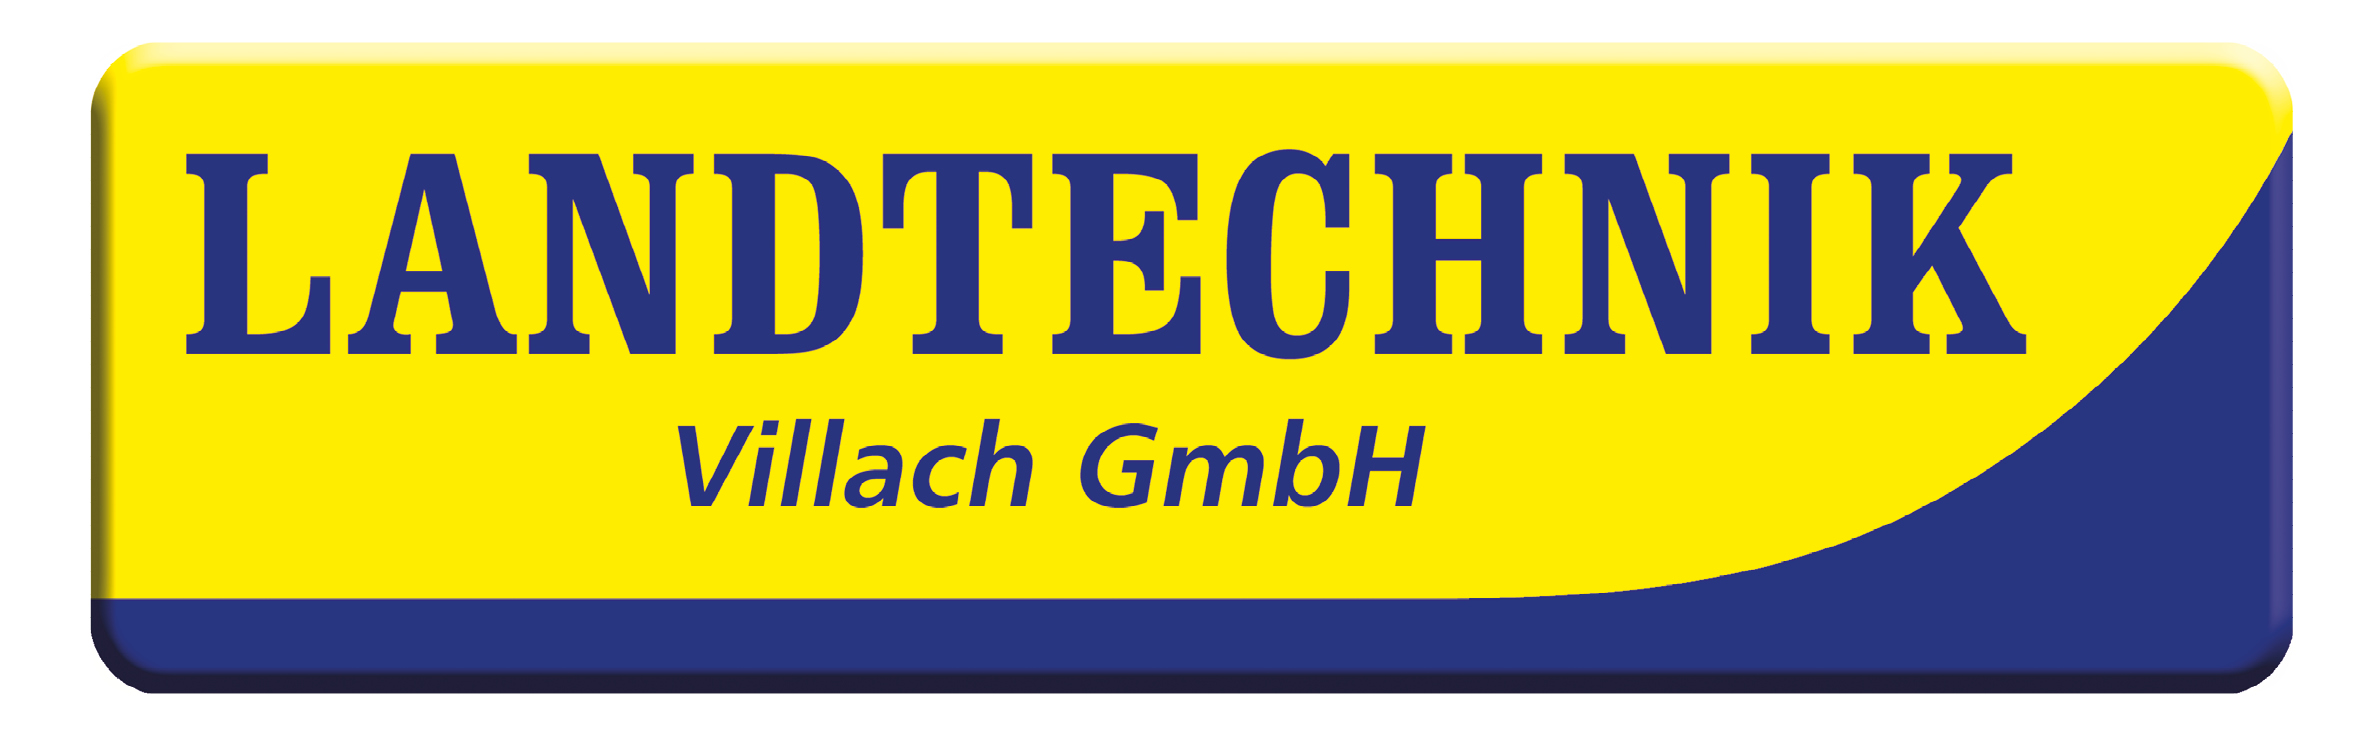 Landtechnik Villach